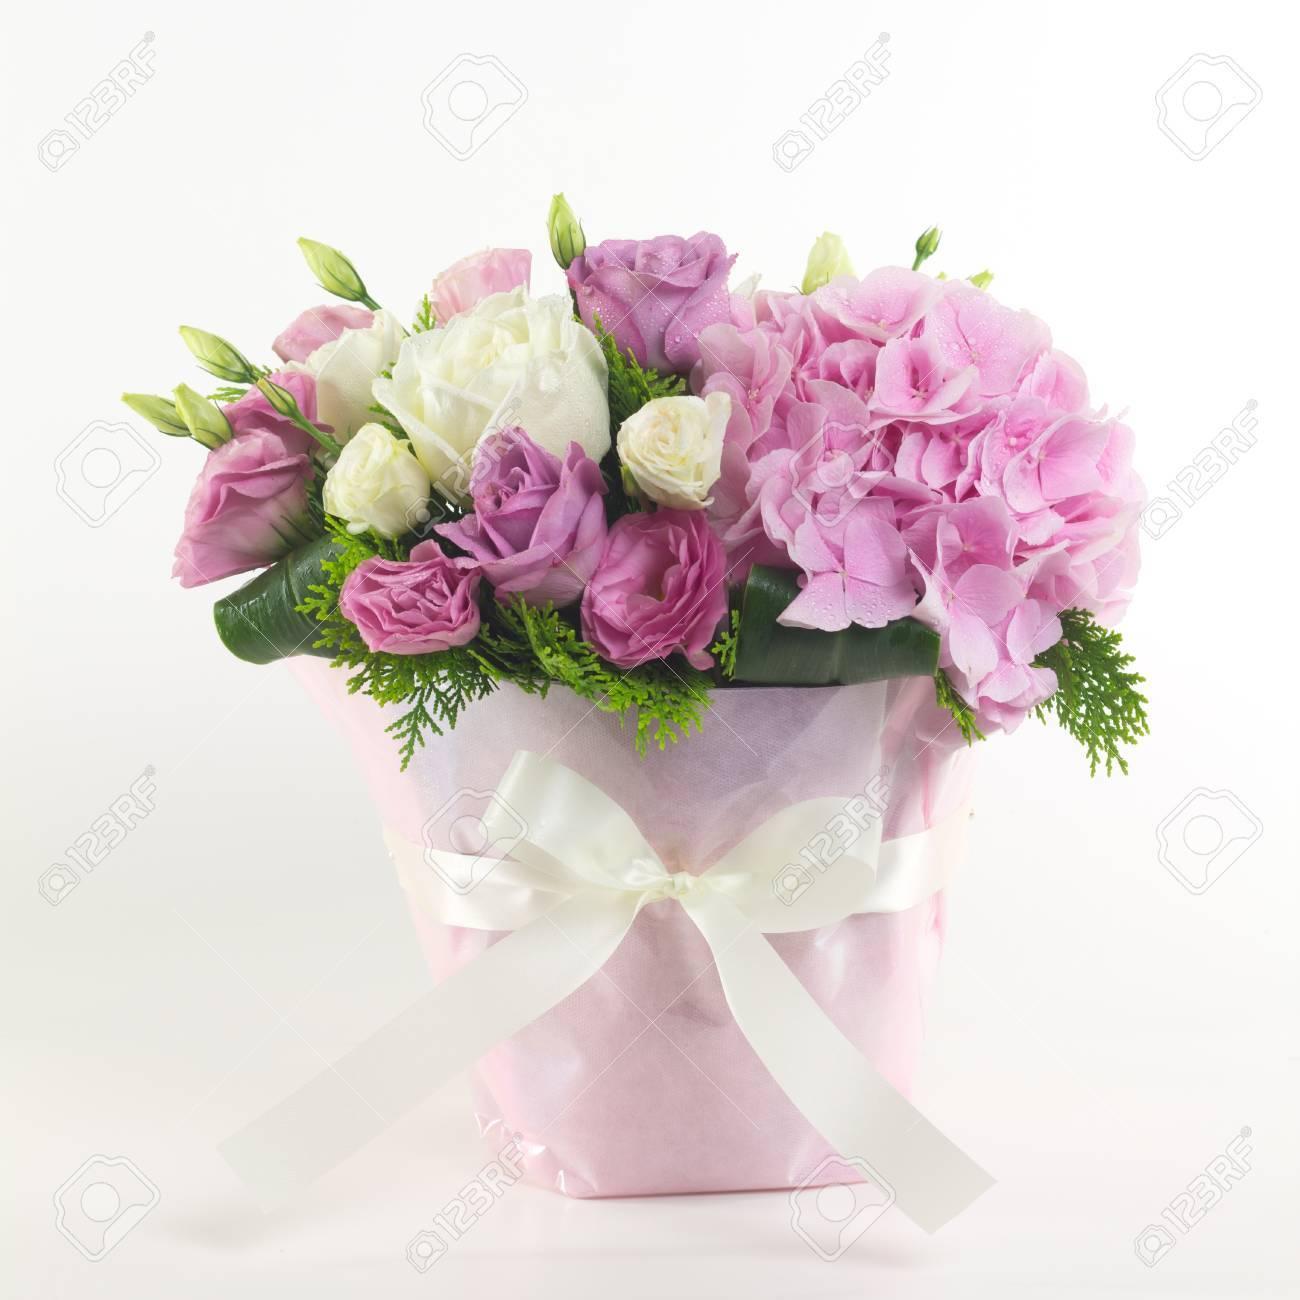 Beautiful flowers in basket isolated stock photo picture and beautiful flowers in basket isolated stock photo 44580142 izmirmasajfo